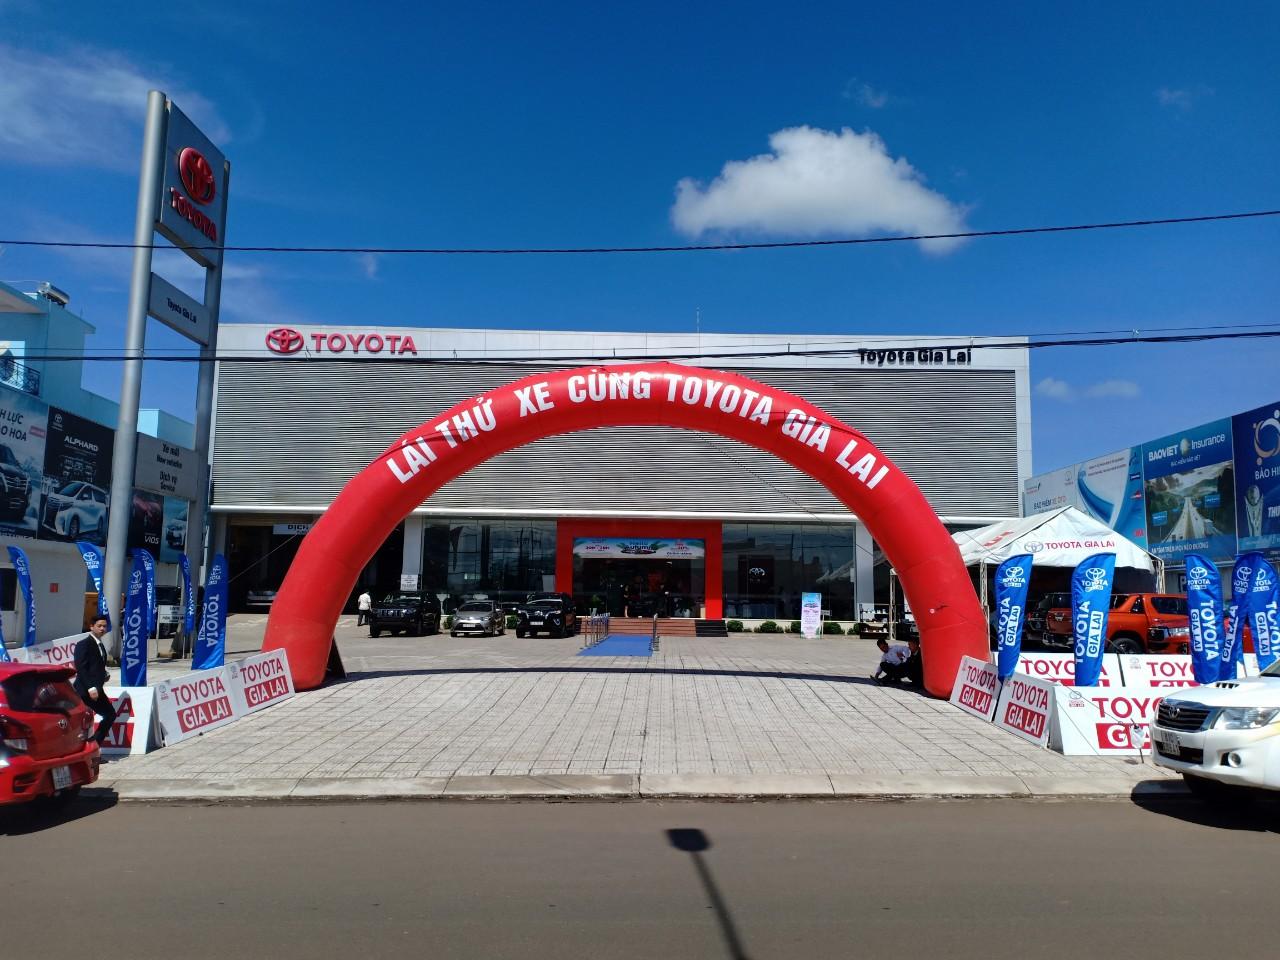 toyota gia lai - Giới thiệu Toyota Việt Nam